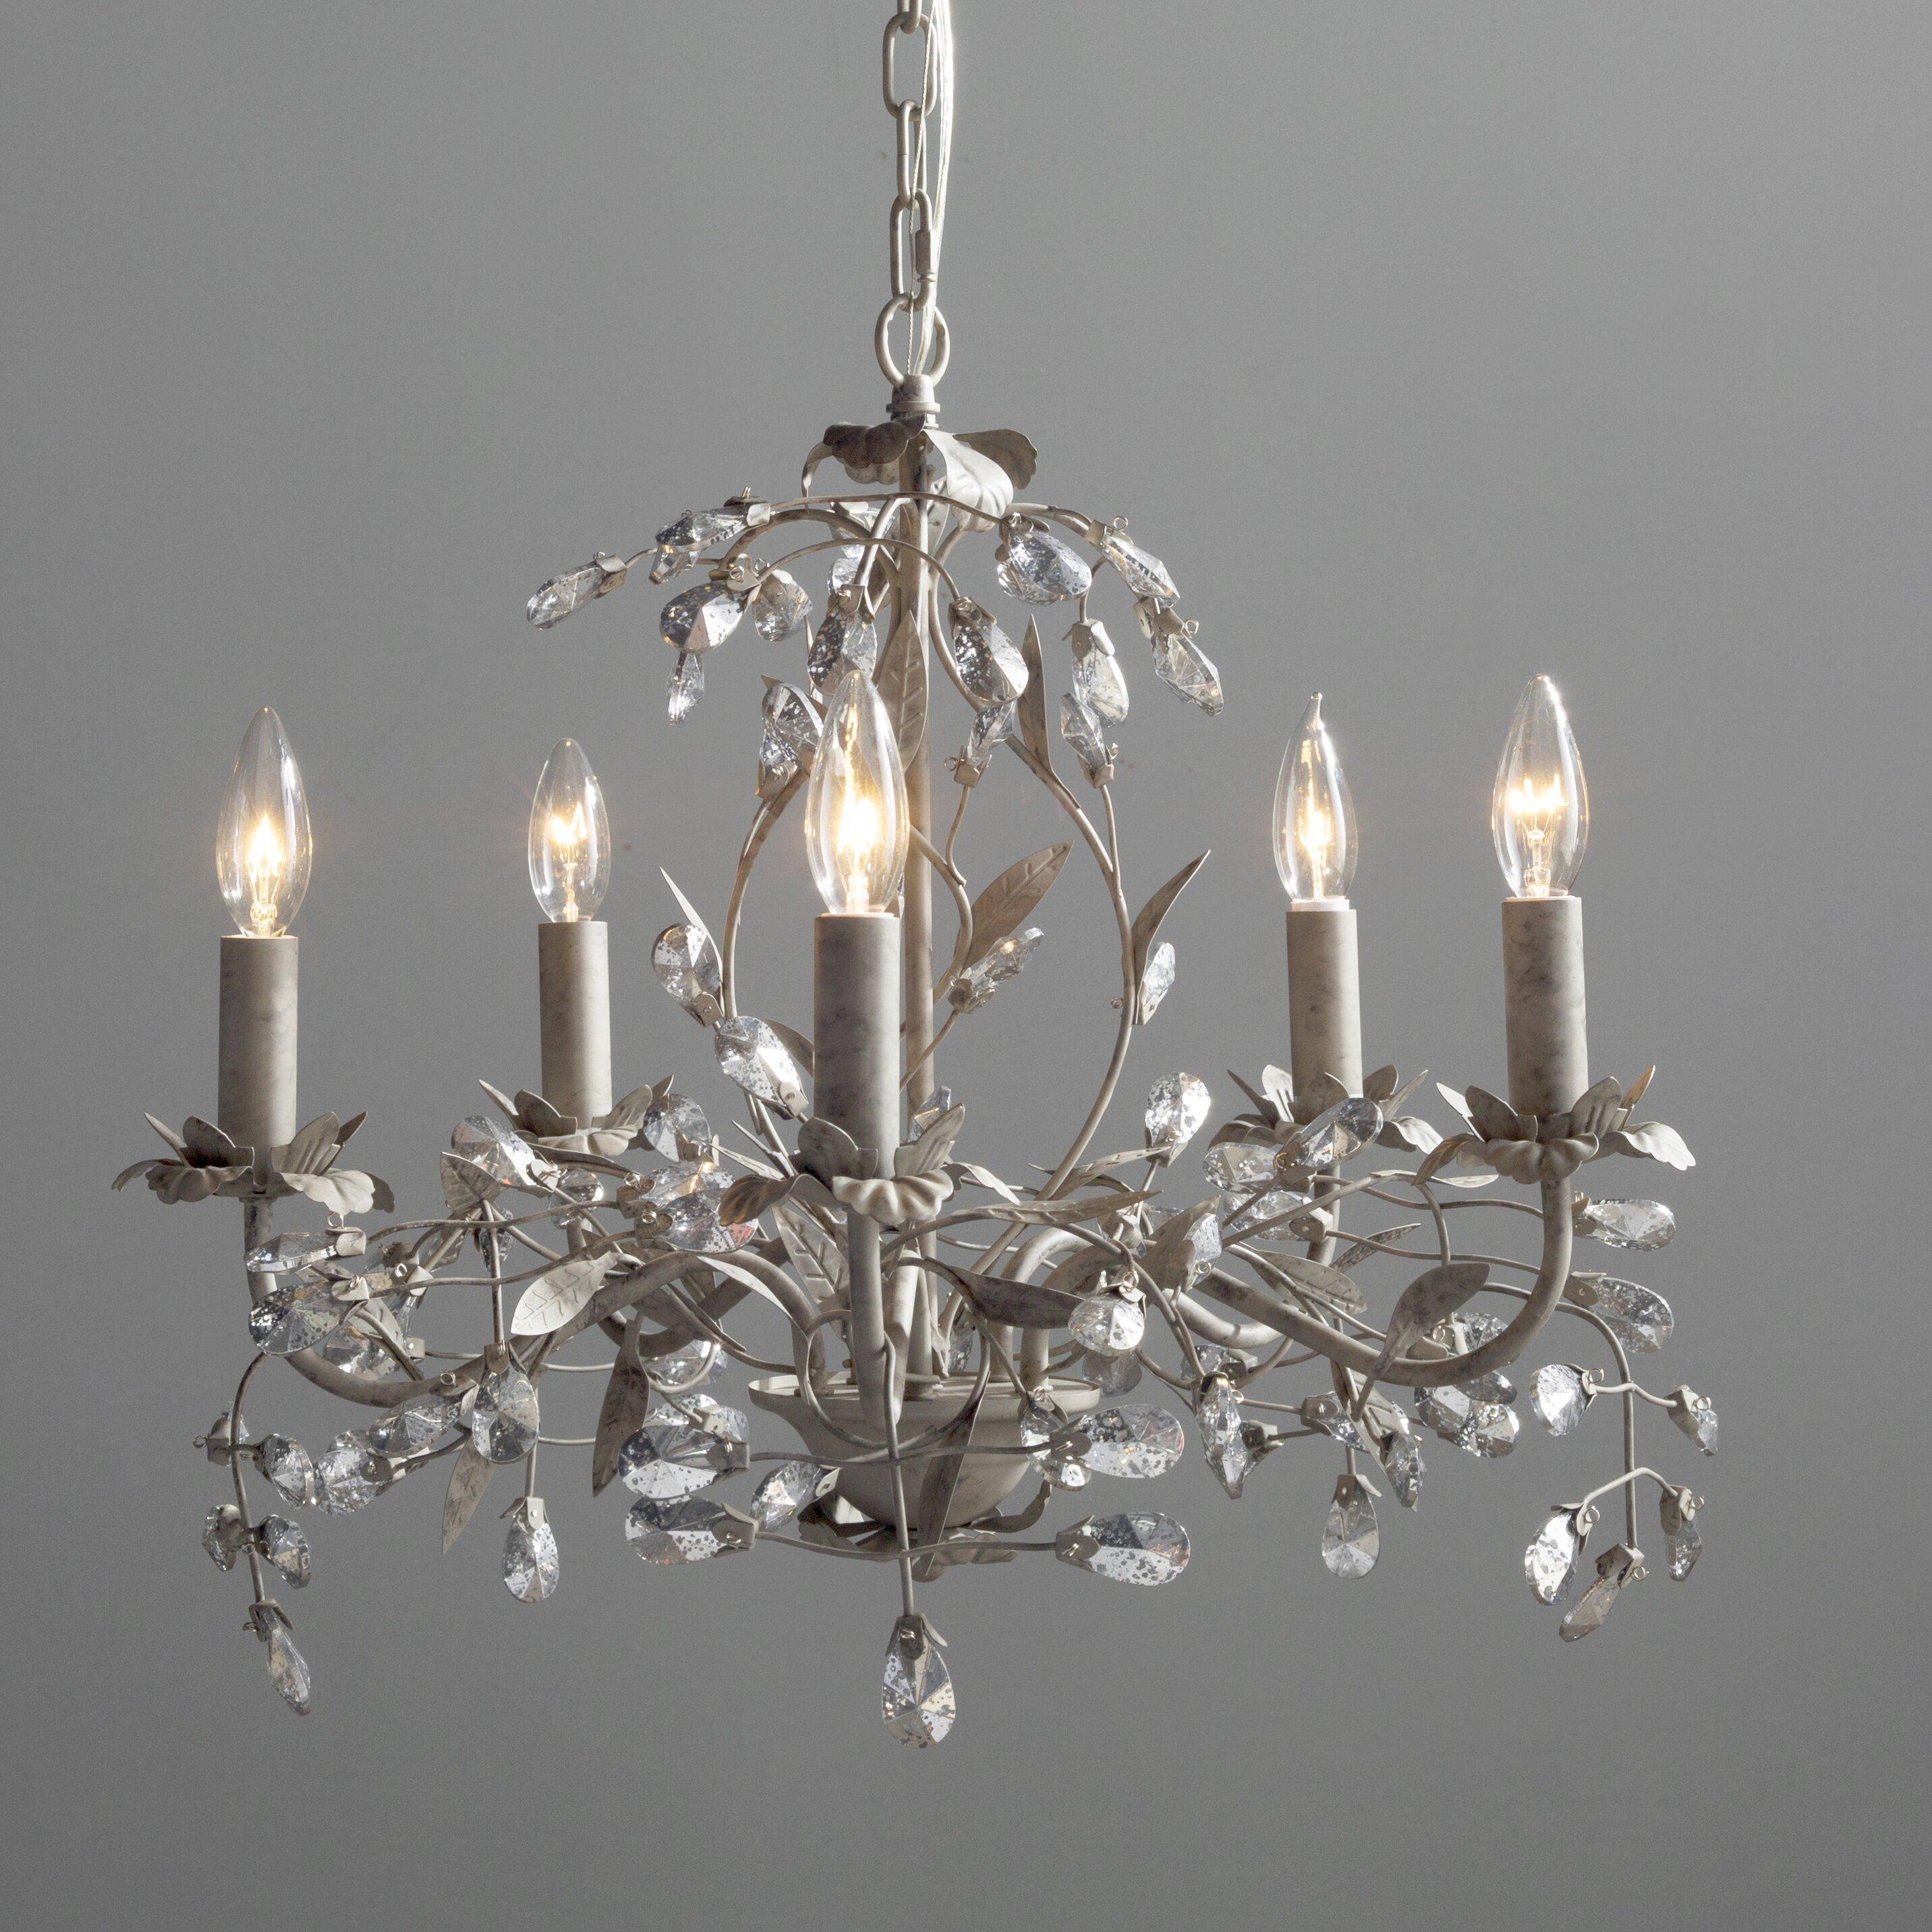 House of Hampton 5Light Crystal Chandelier Reviews – Crystal Chandelier Lights